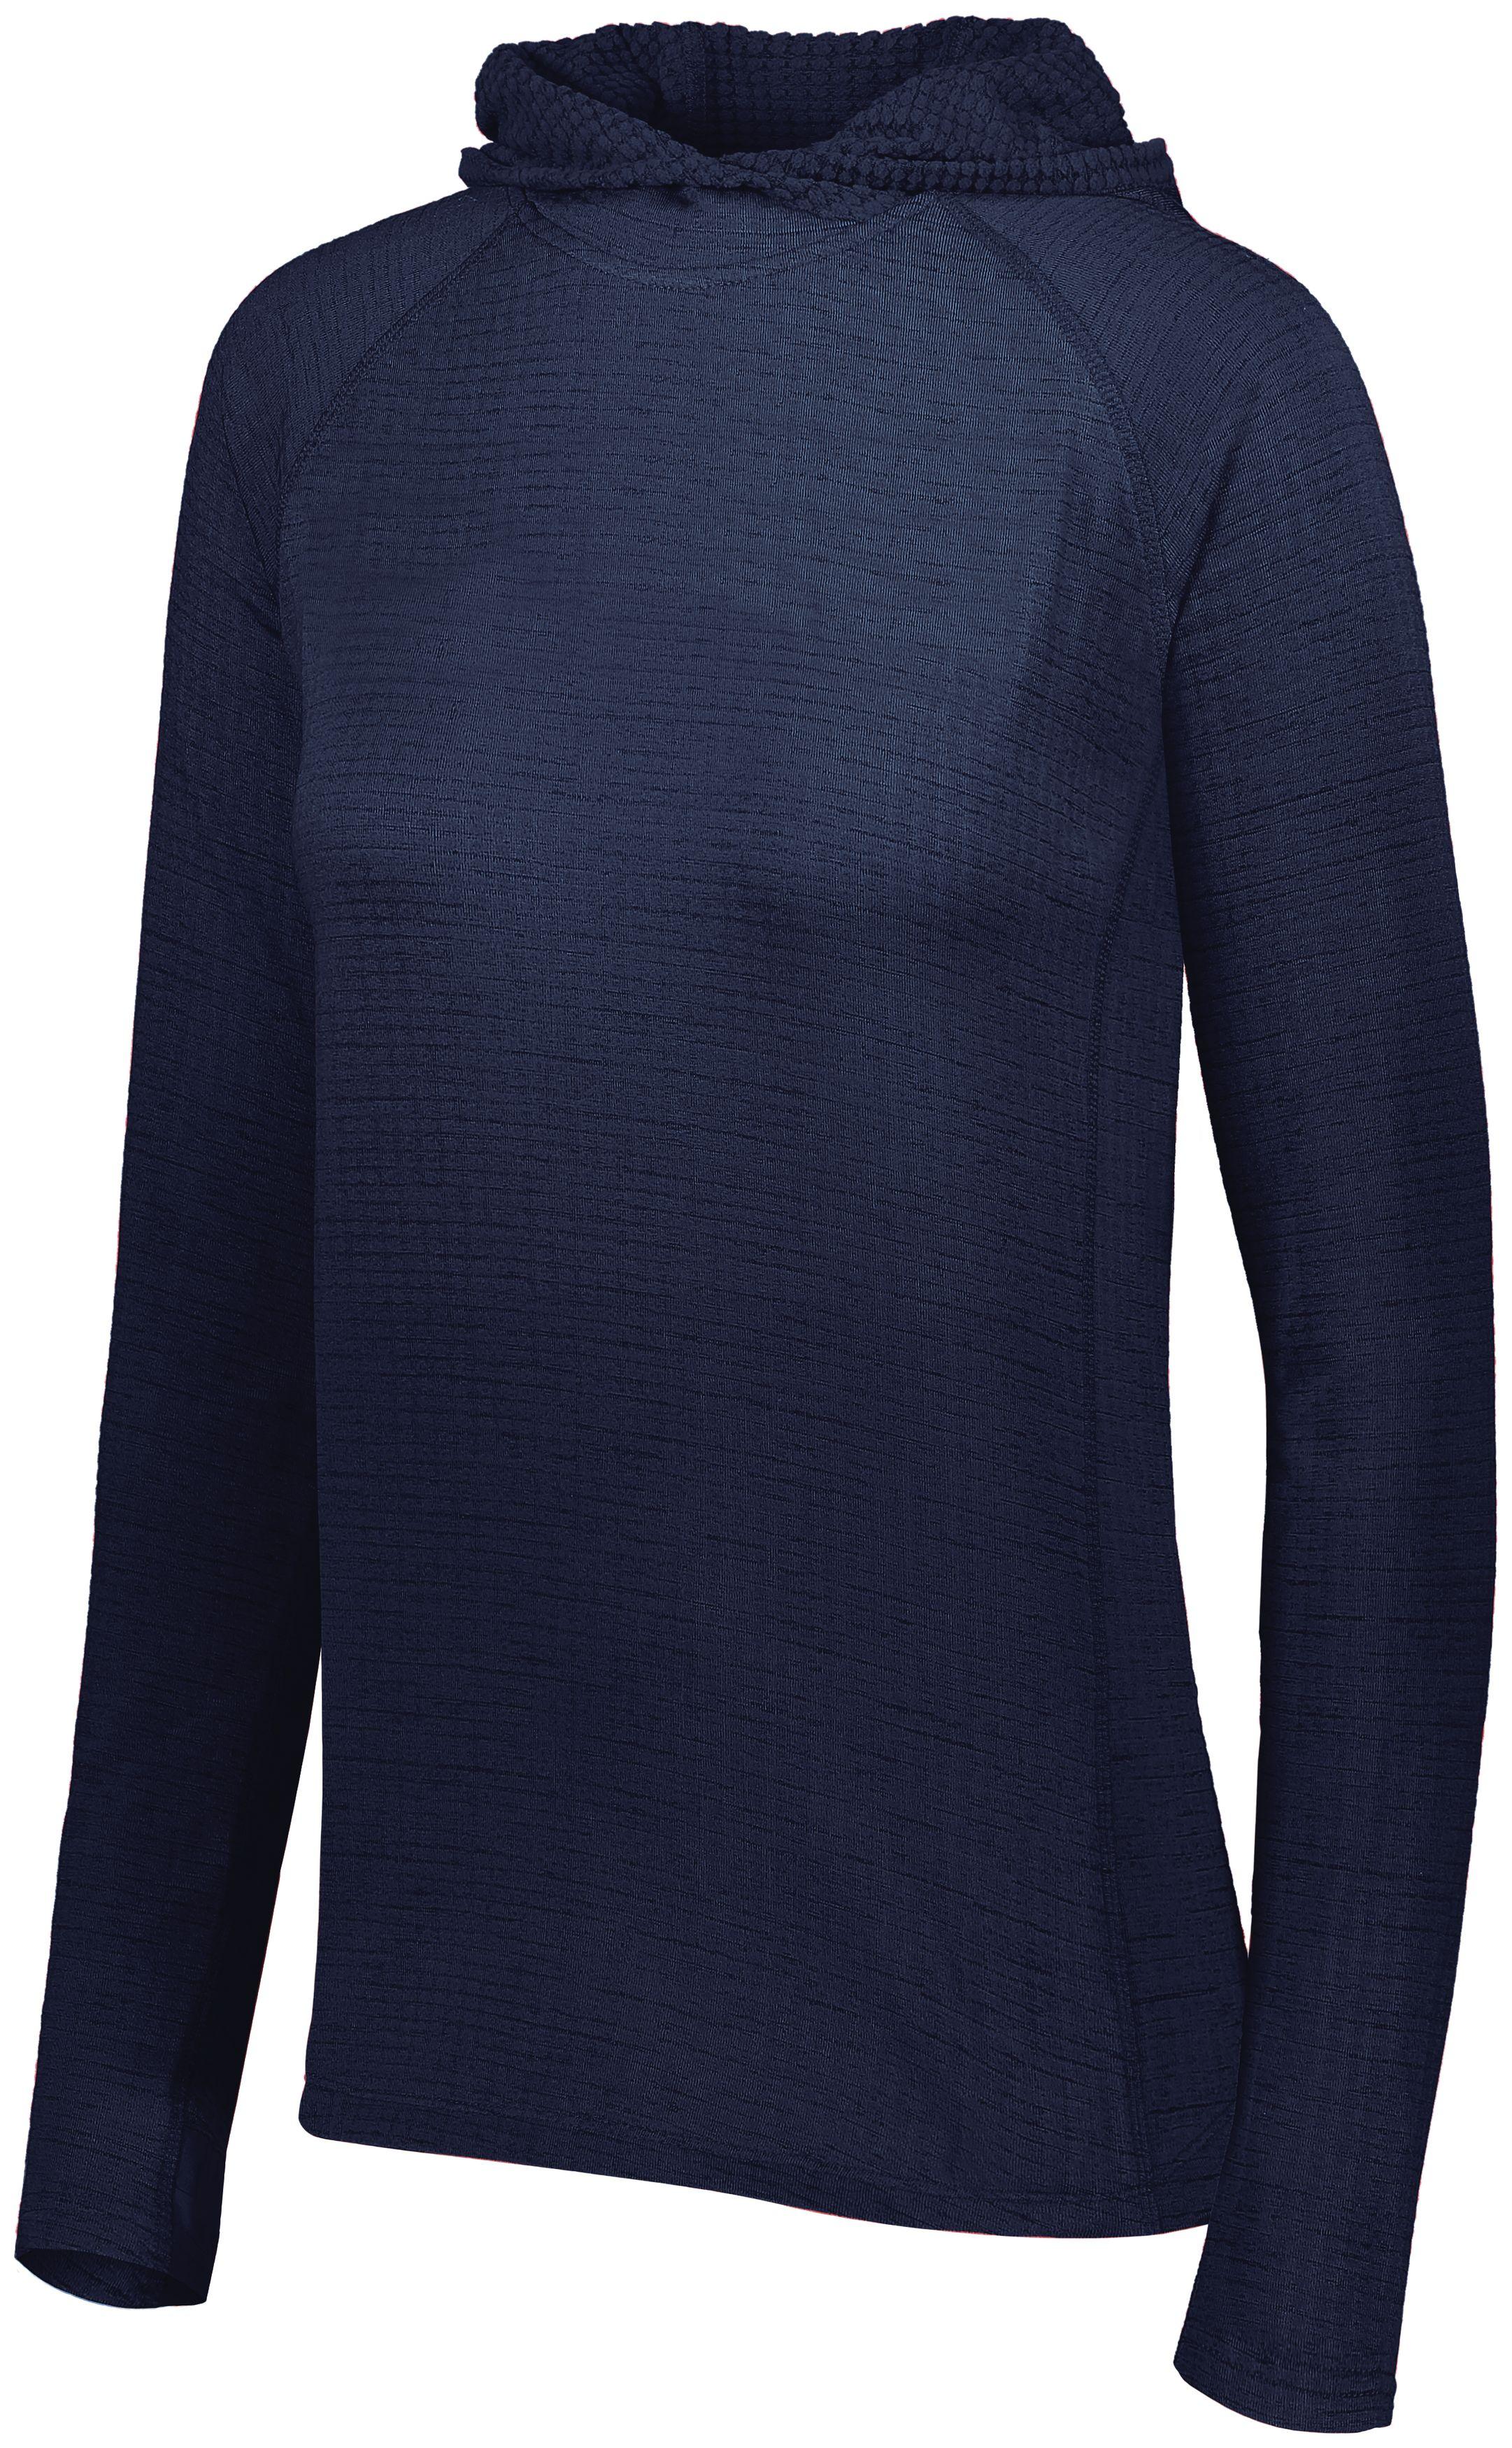 Ladies 3D Regulate Lightweight Pullover - NAVY HEATHER